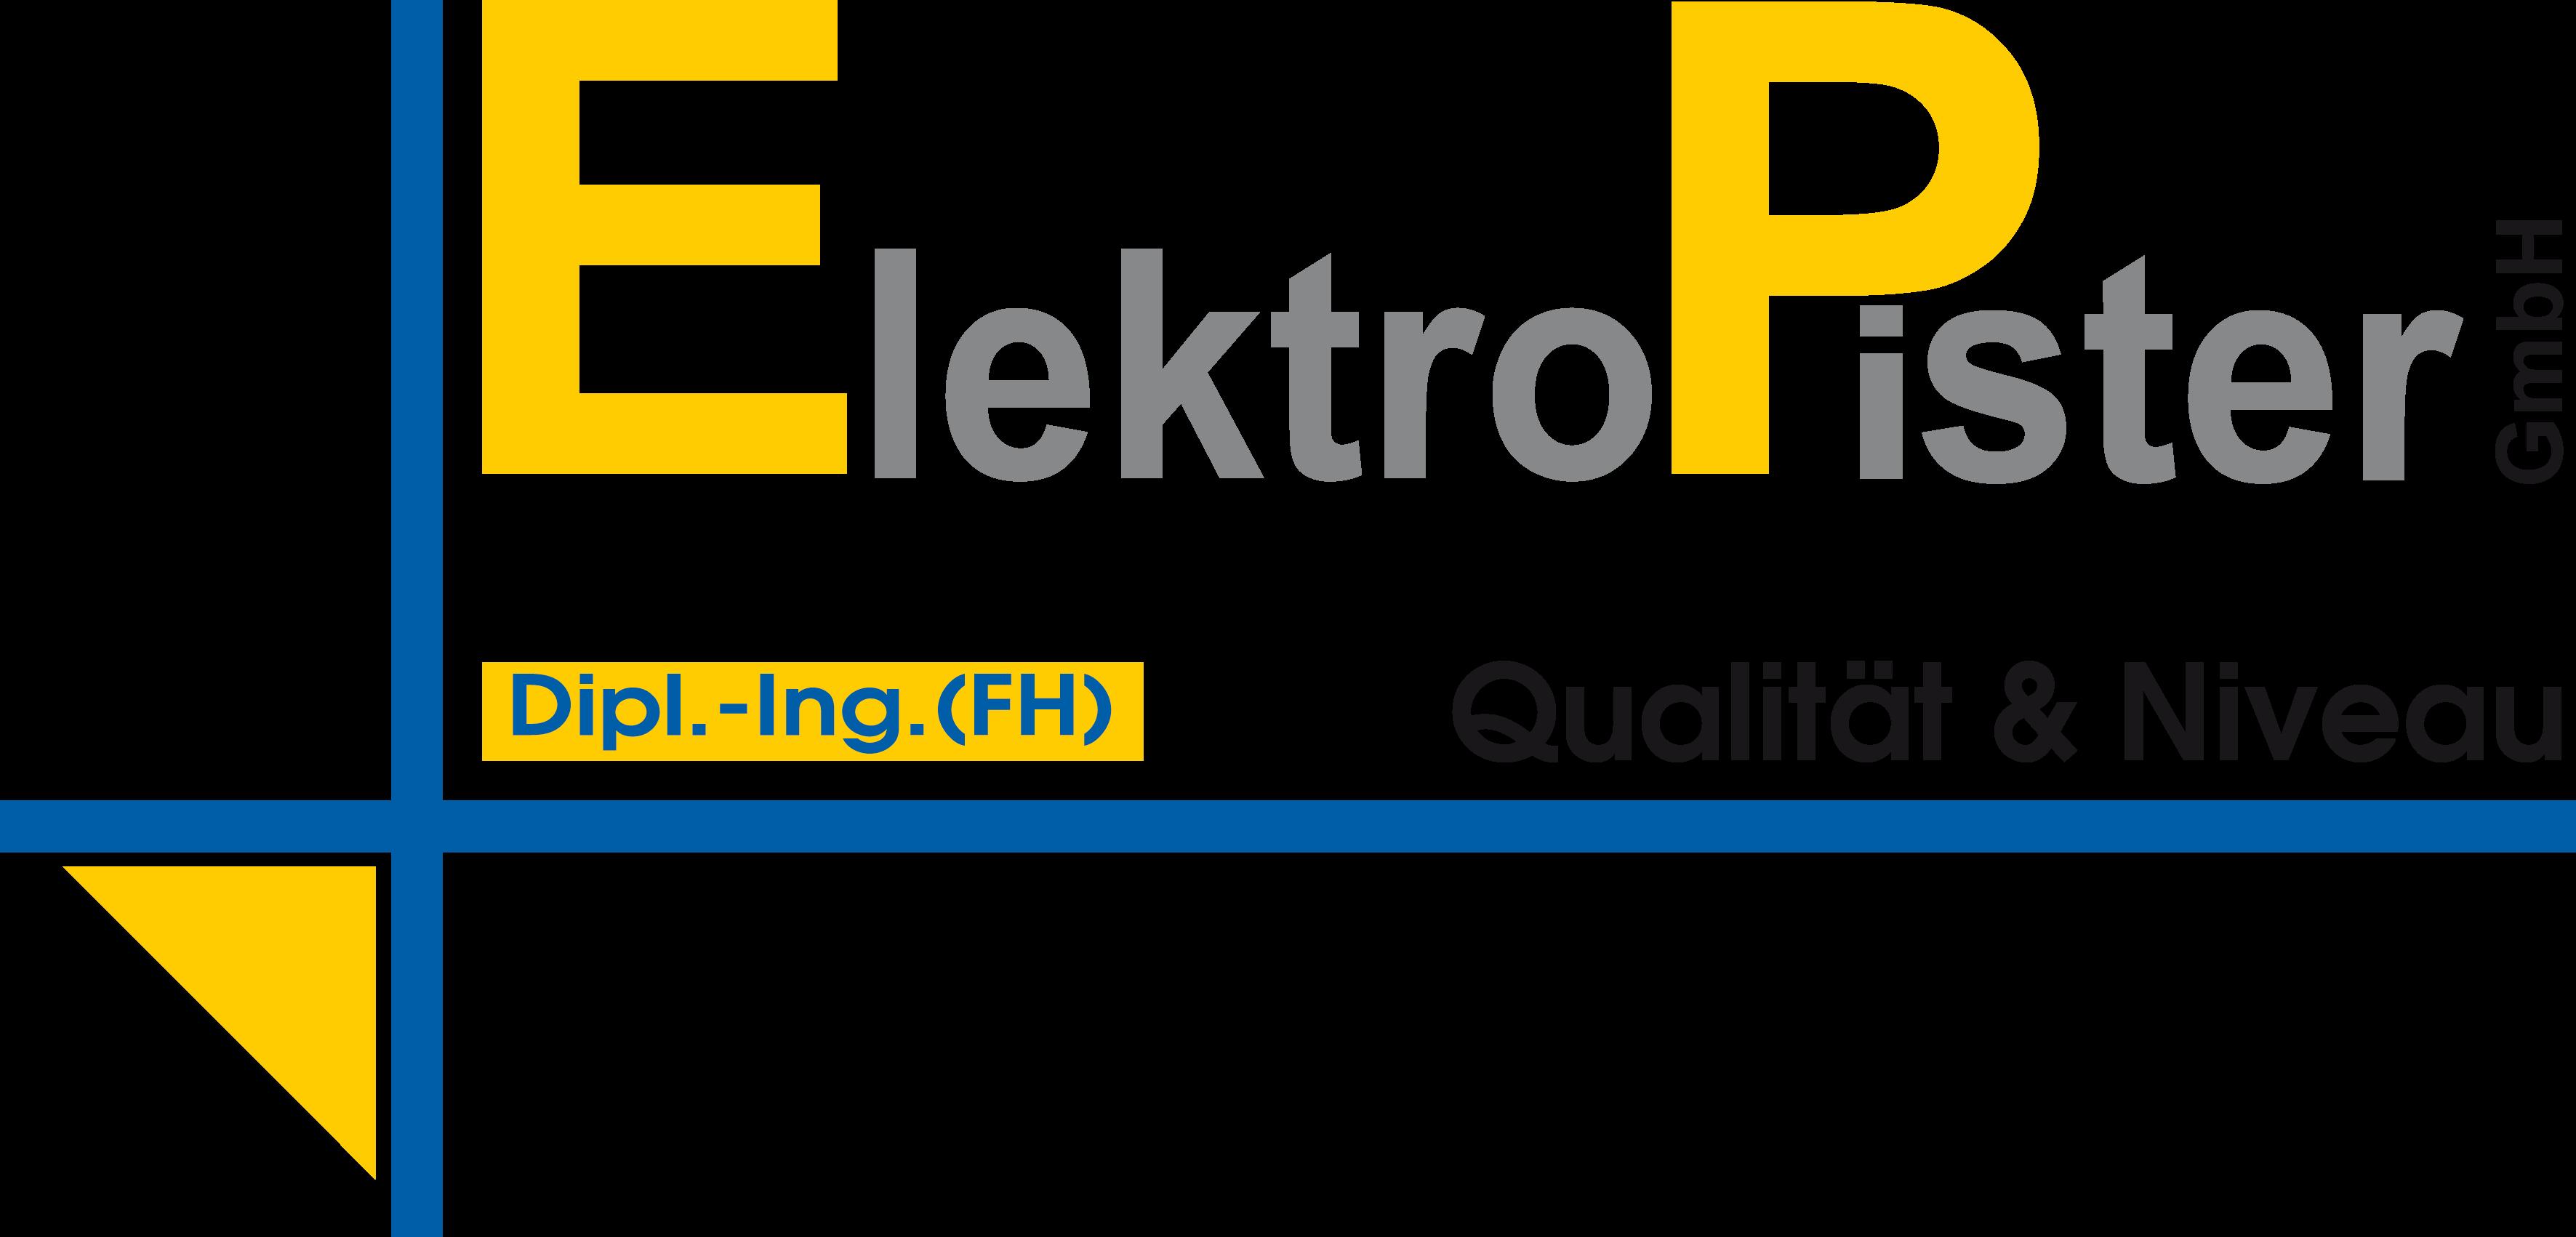 Elektro Pister GmbH